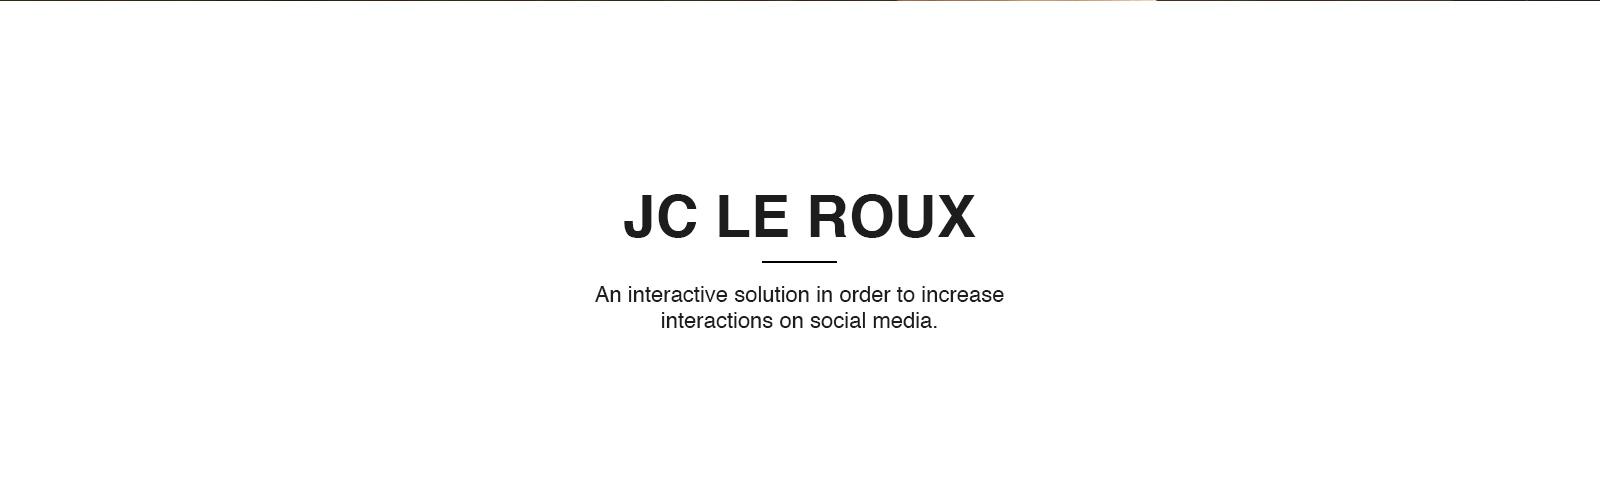 JCLeRoux_Layout_1